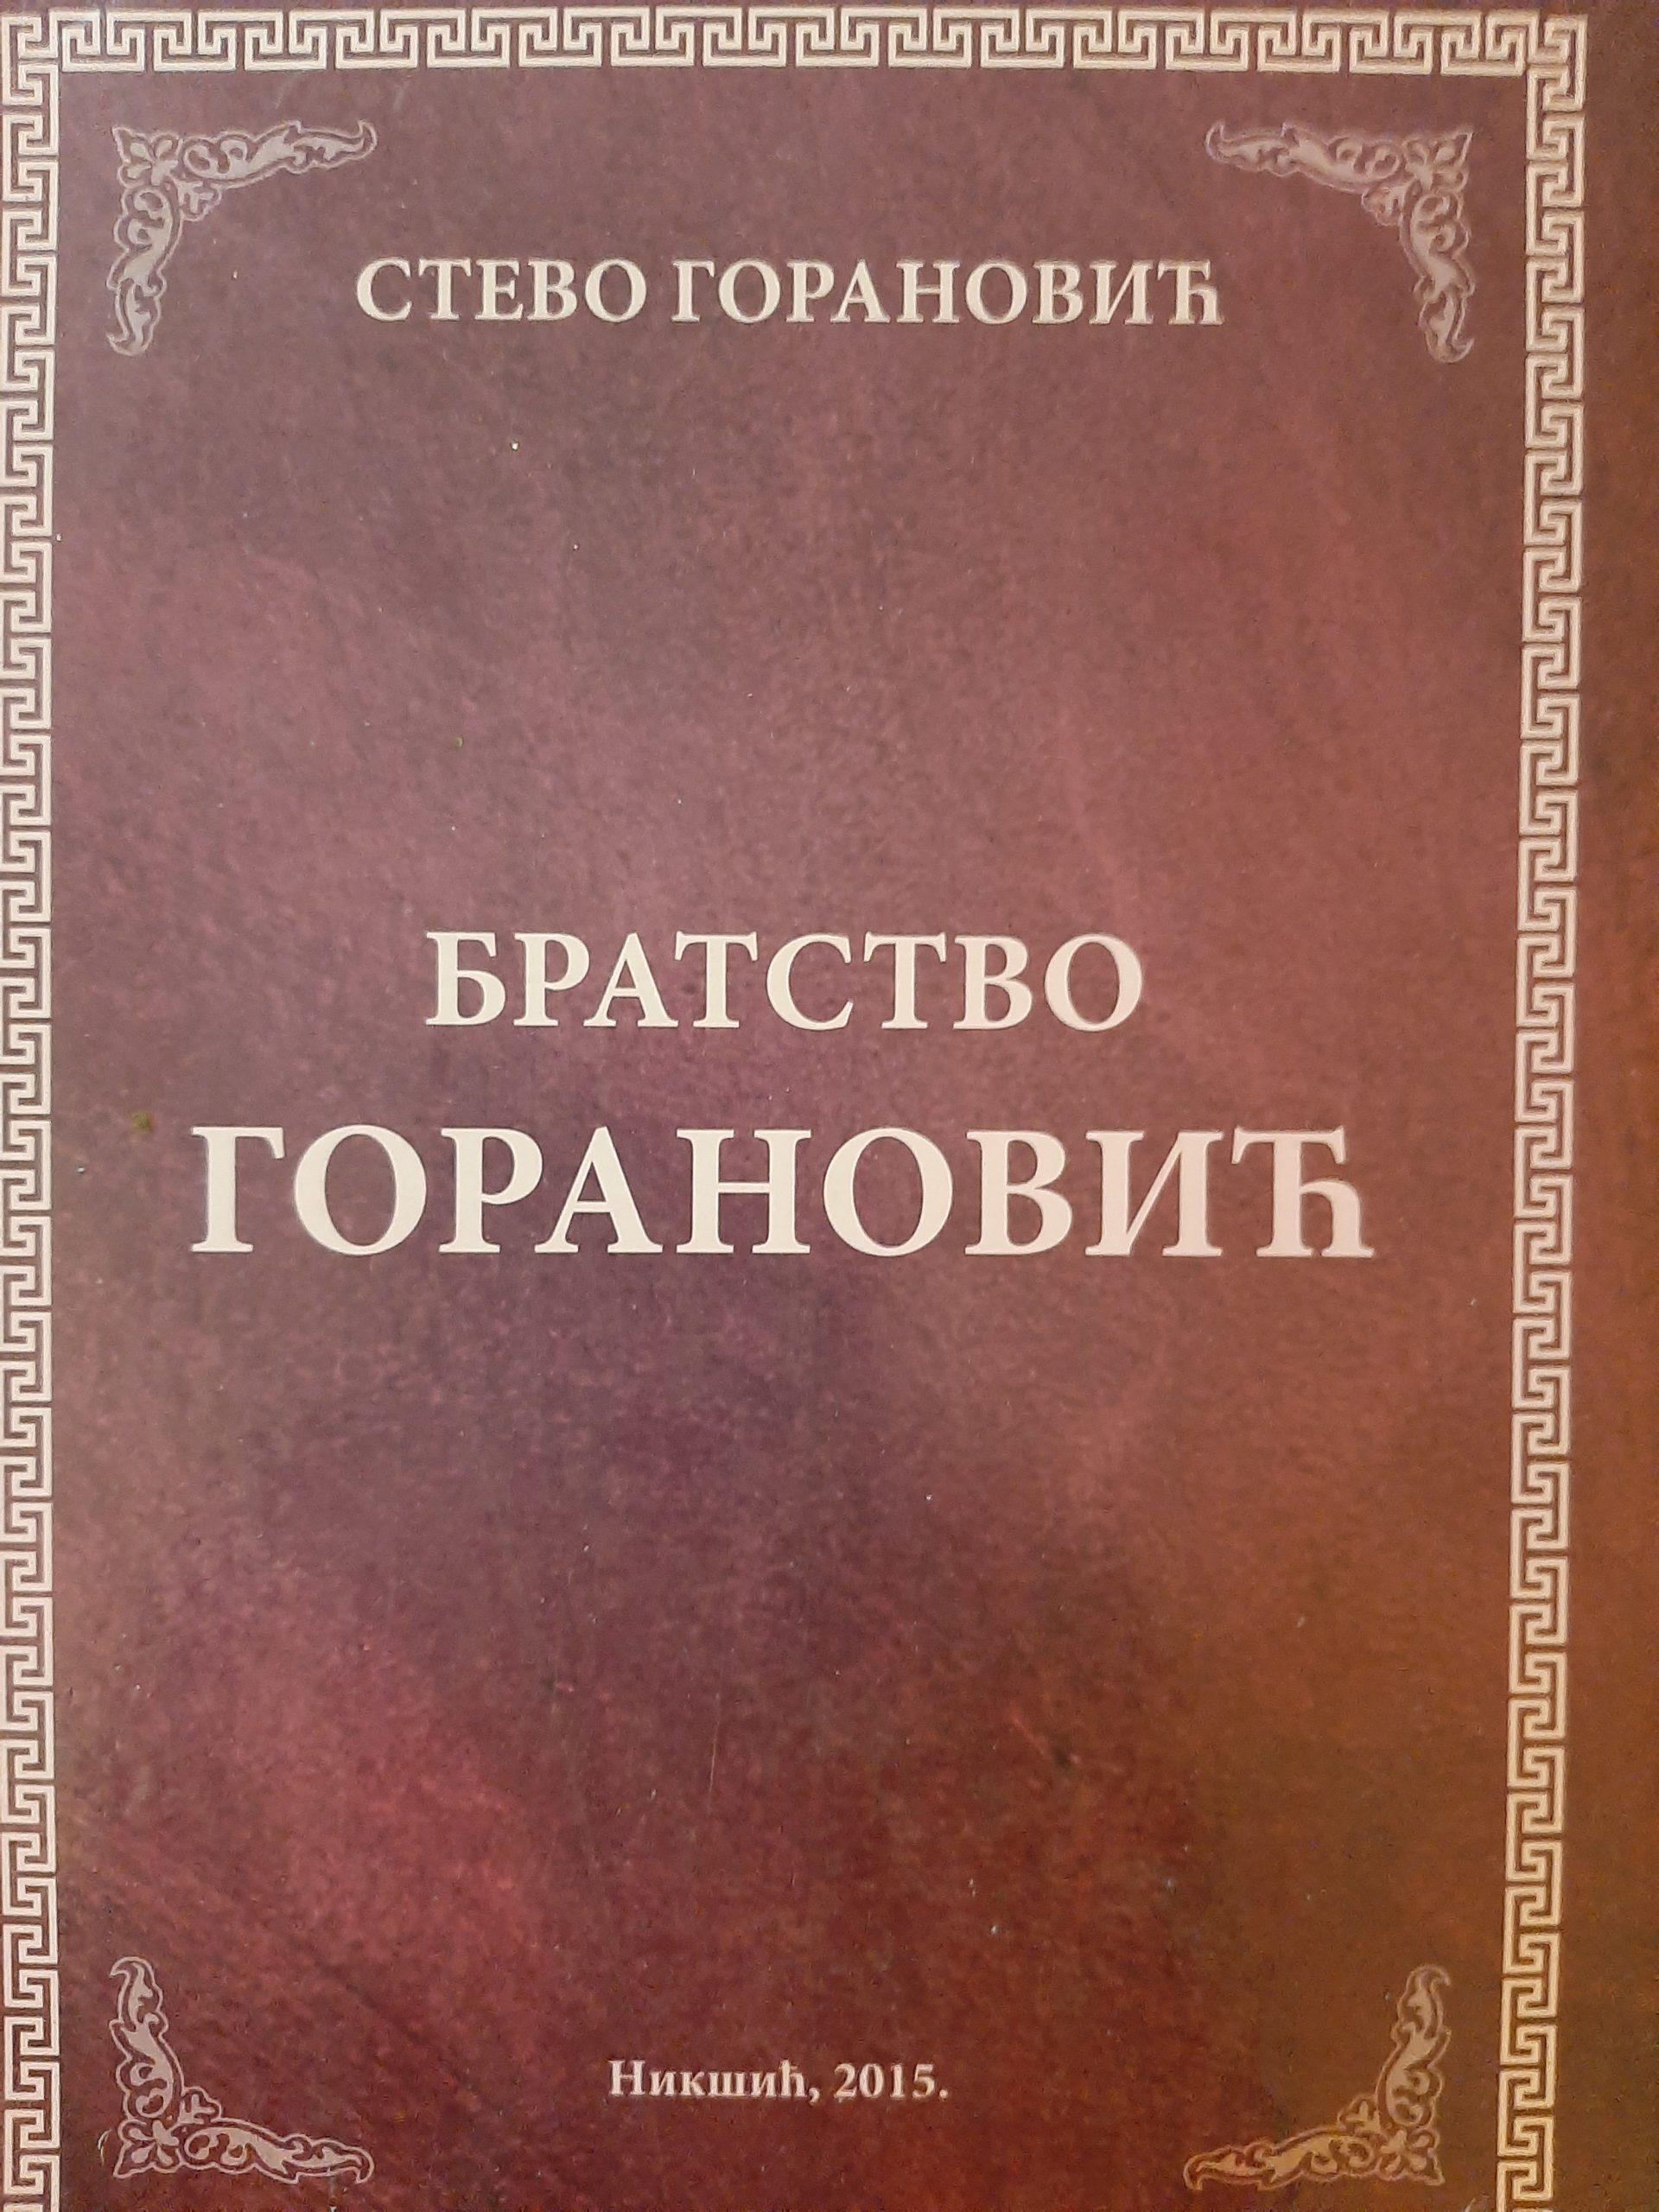 Sabratsva